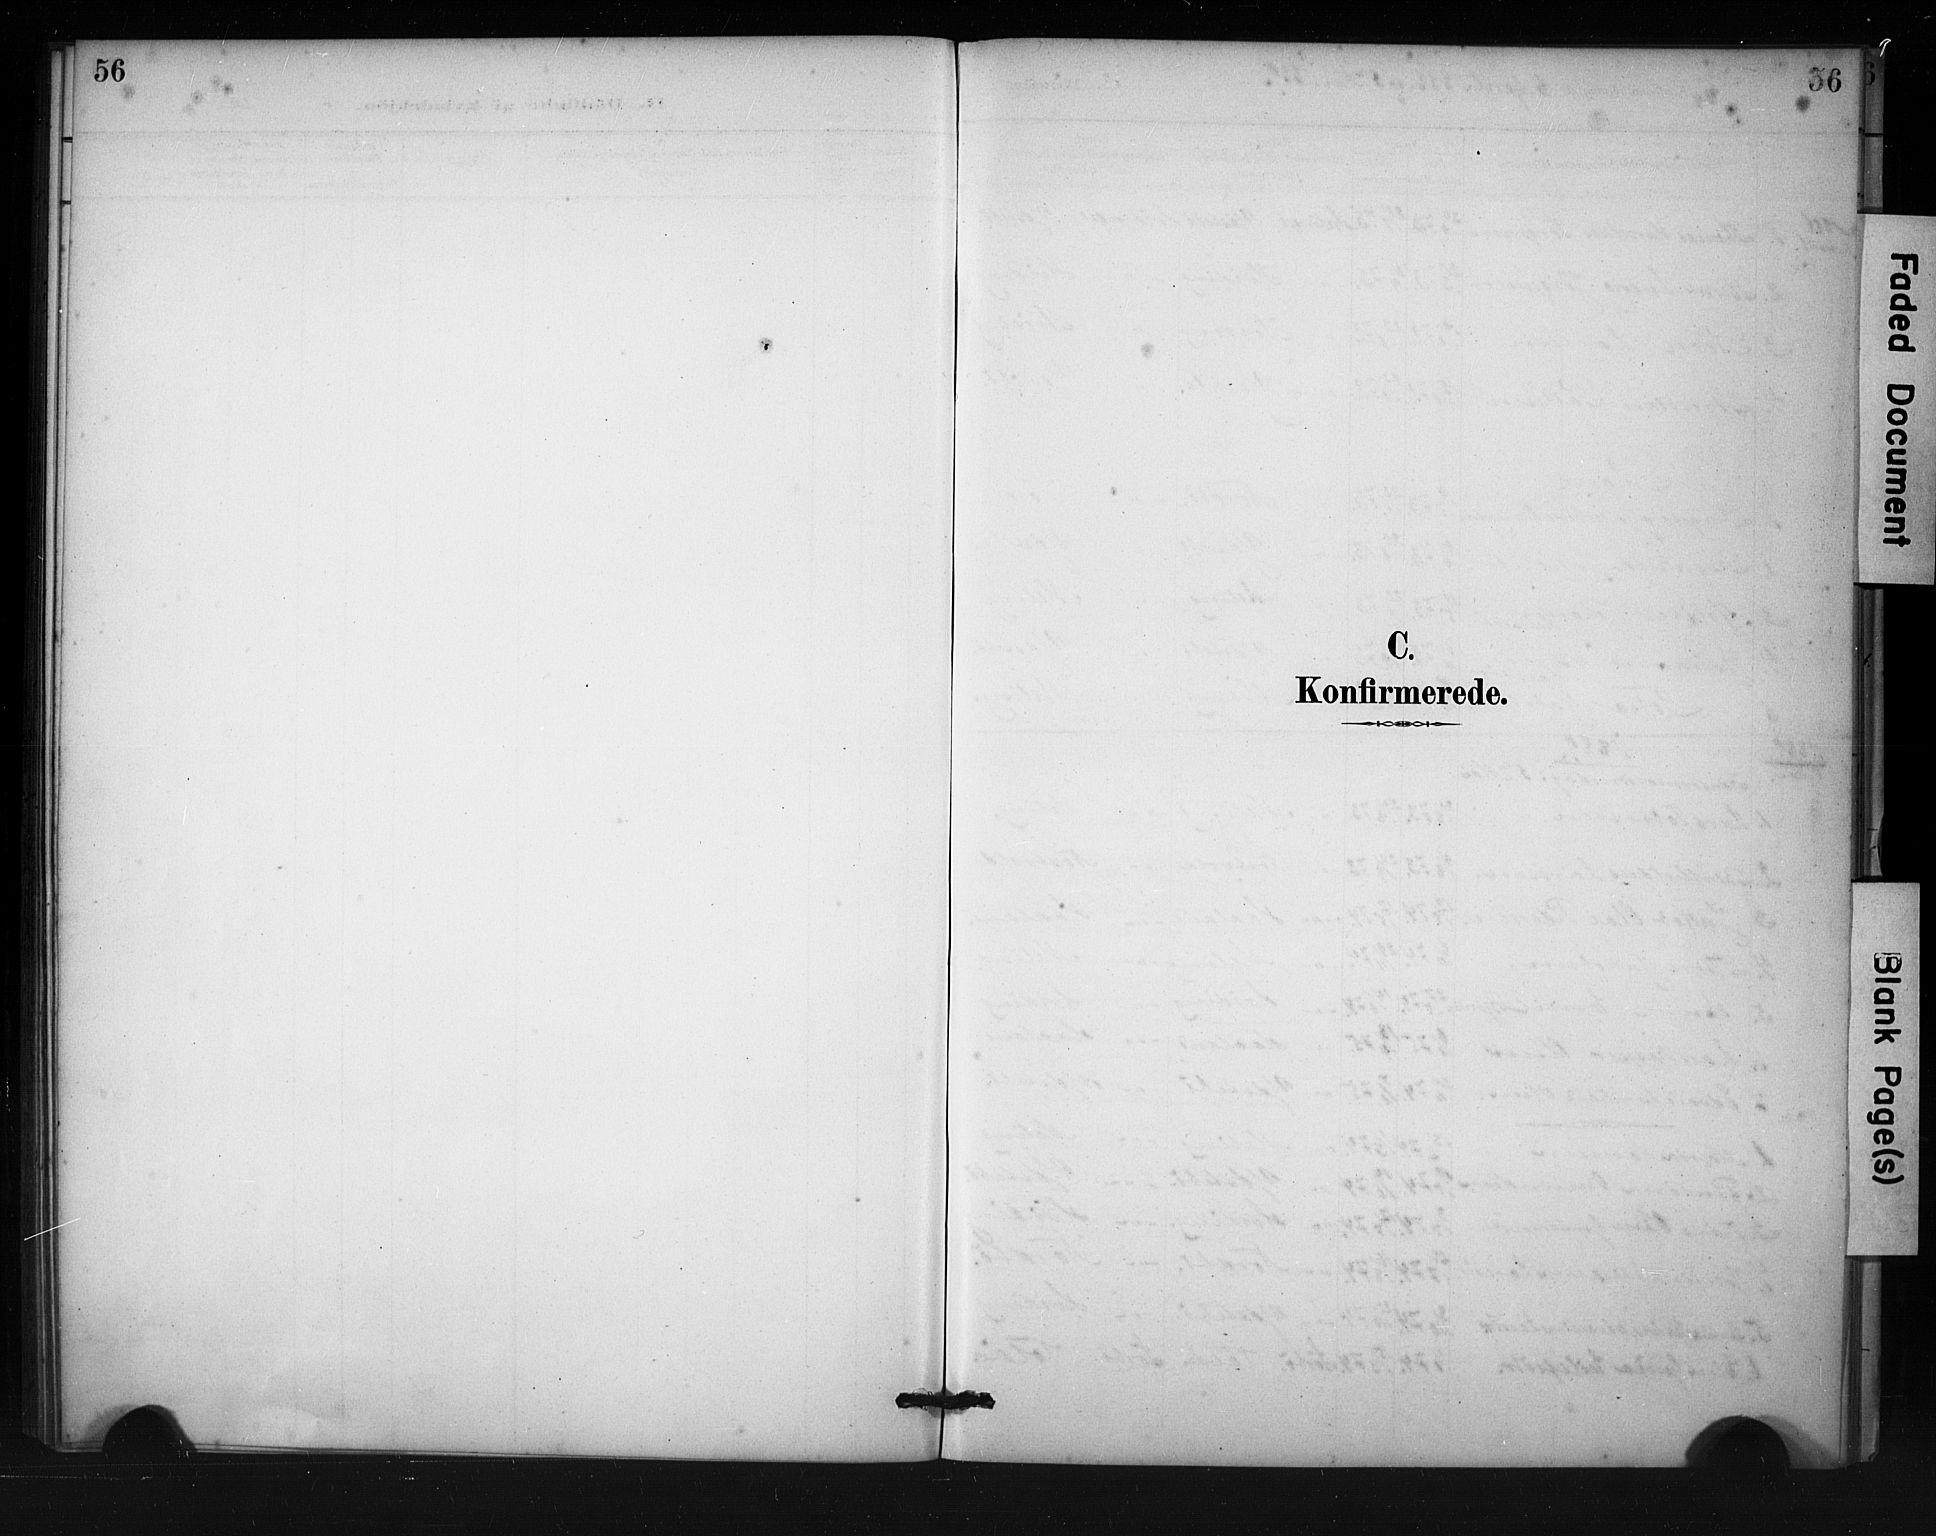 SAST, Rennesøy sokneprestkontor, H/Ha/Haa/L0013: Ministerialbok nr. A 12, 1888-1916, s. 56